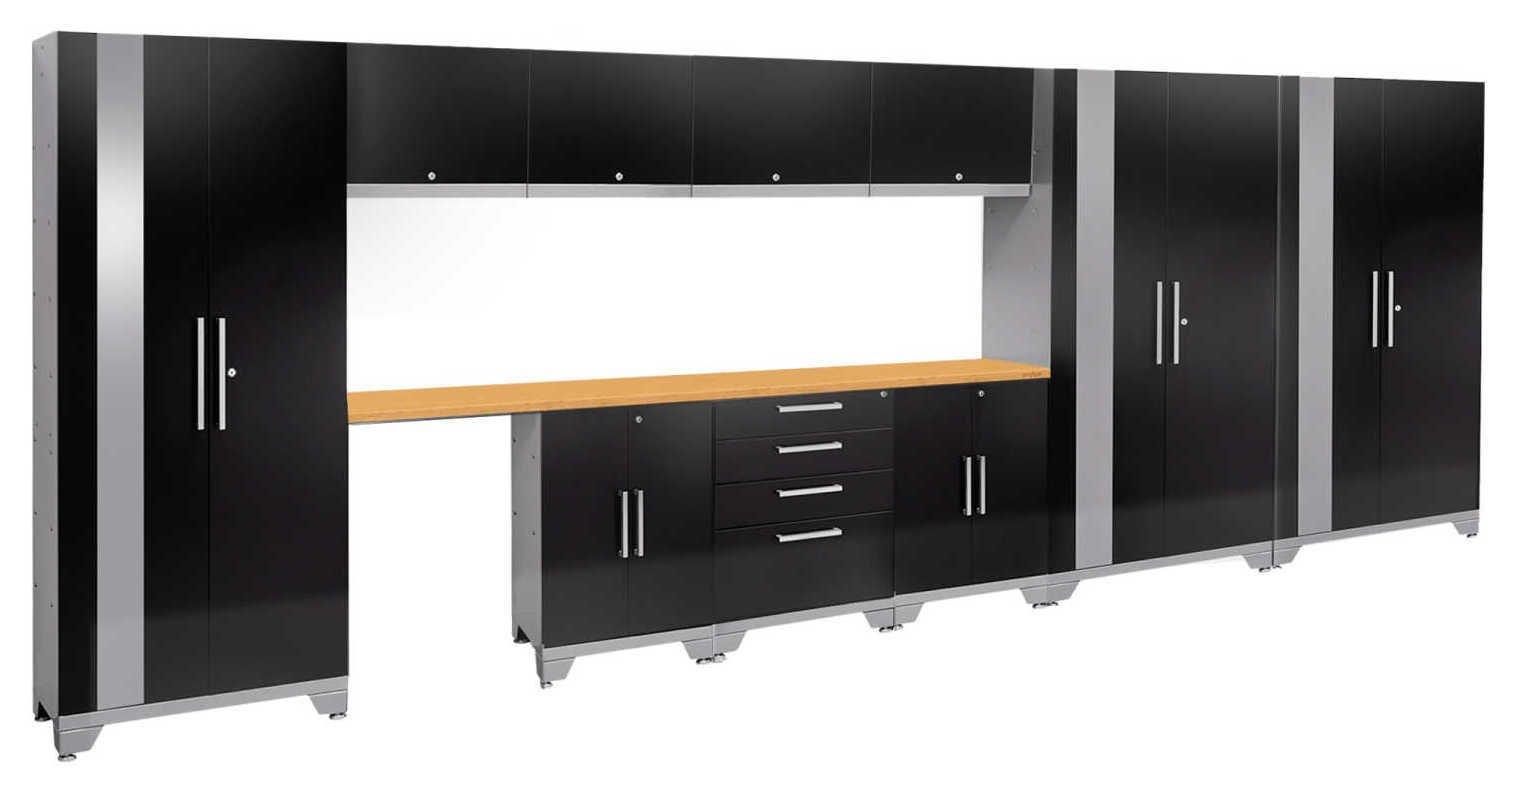 Image of Performance 2.0 Black 12 piece Garage Set - 11 Shelves